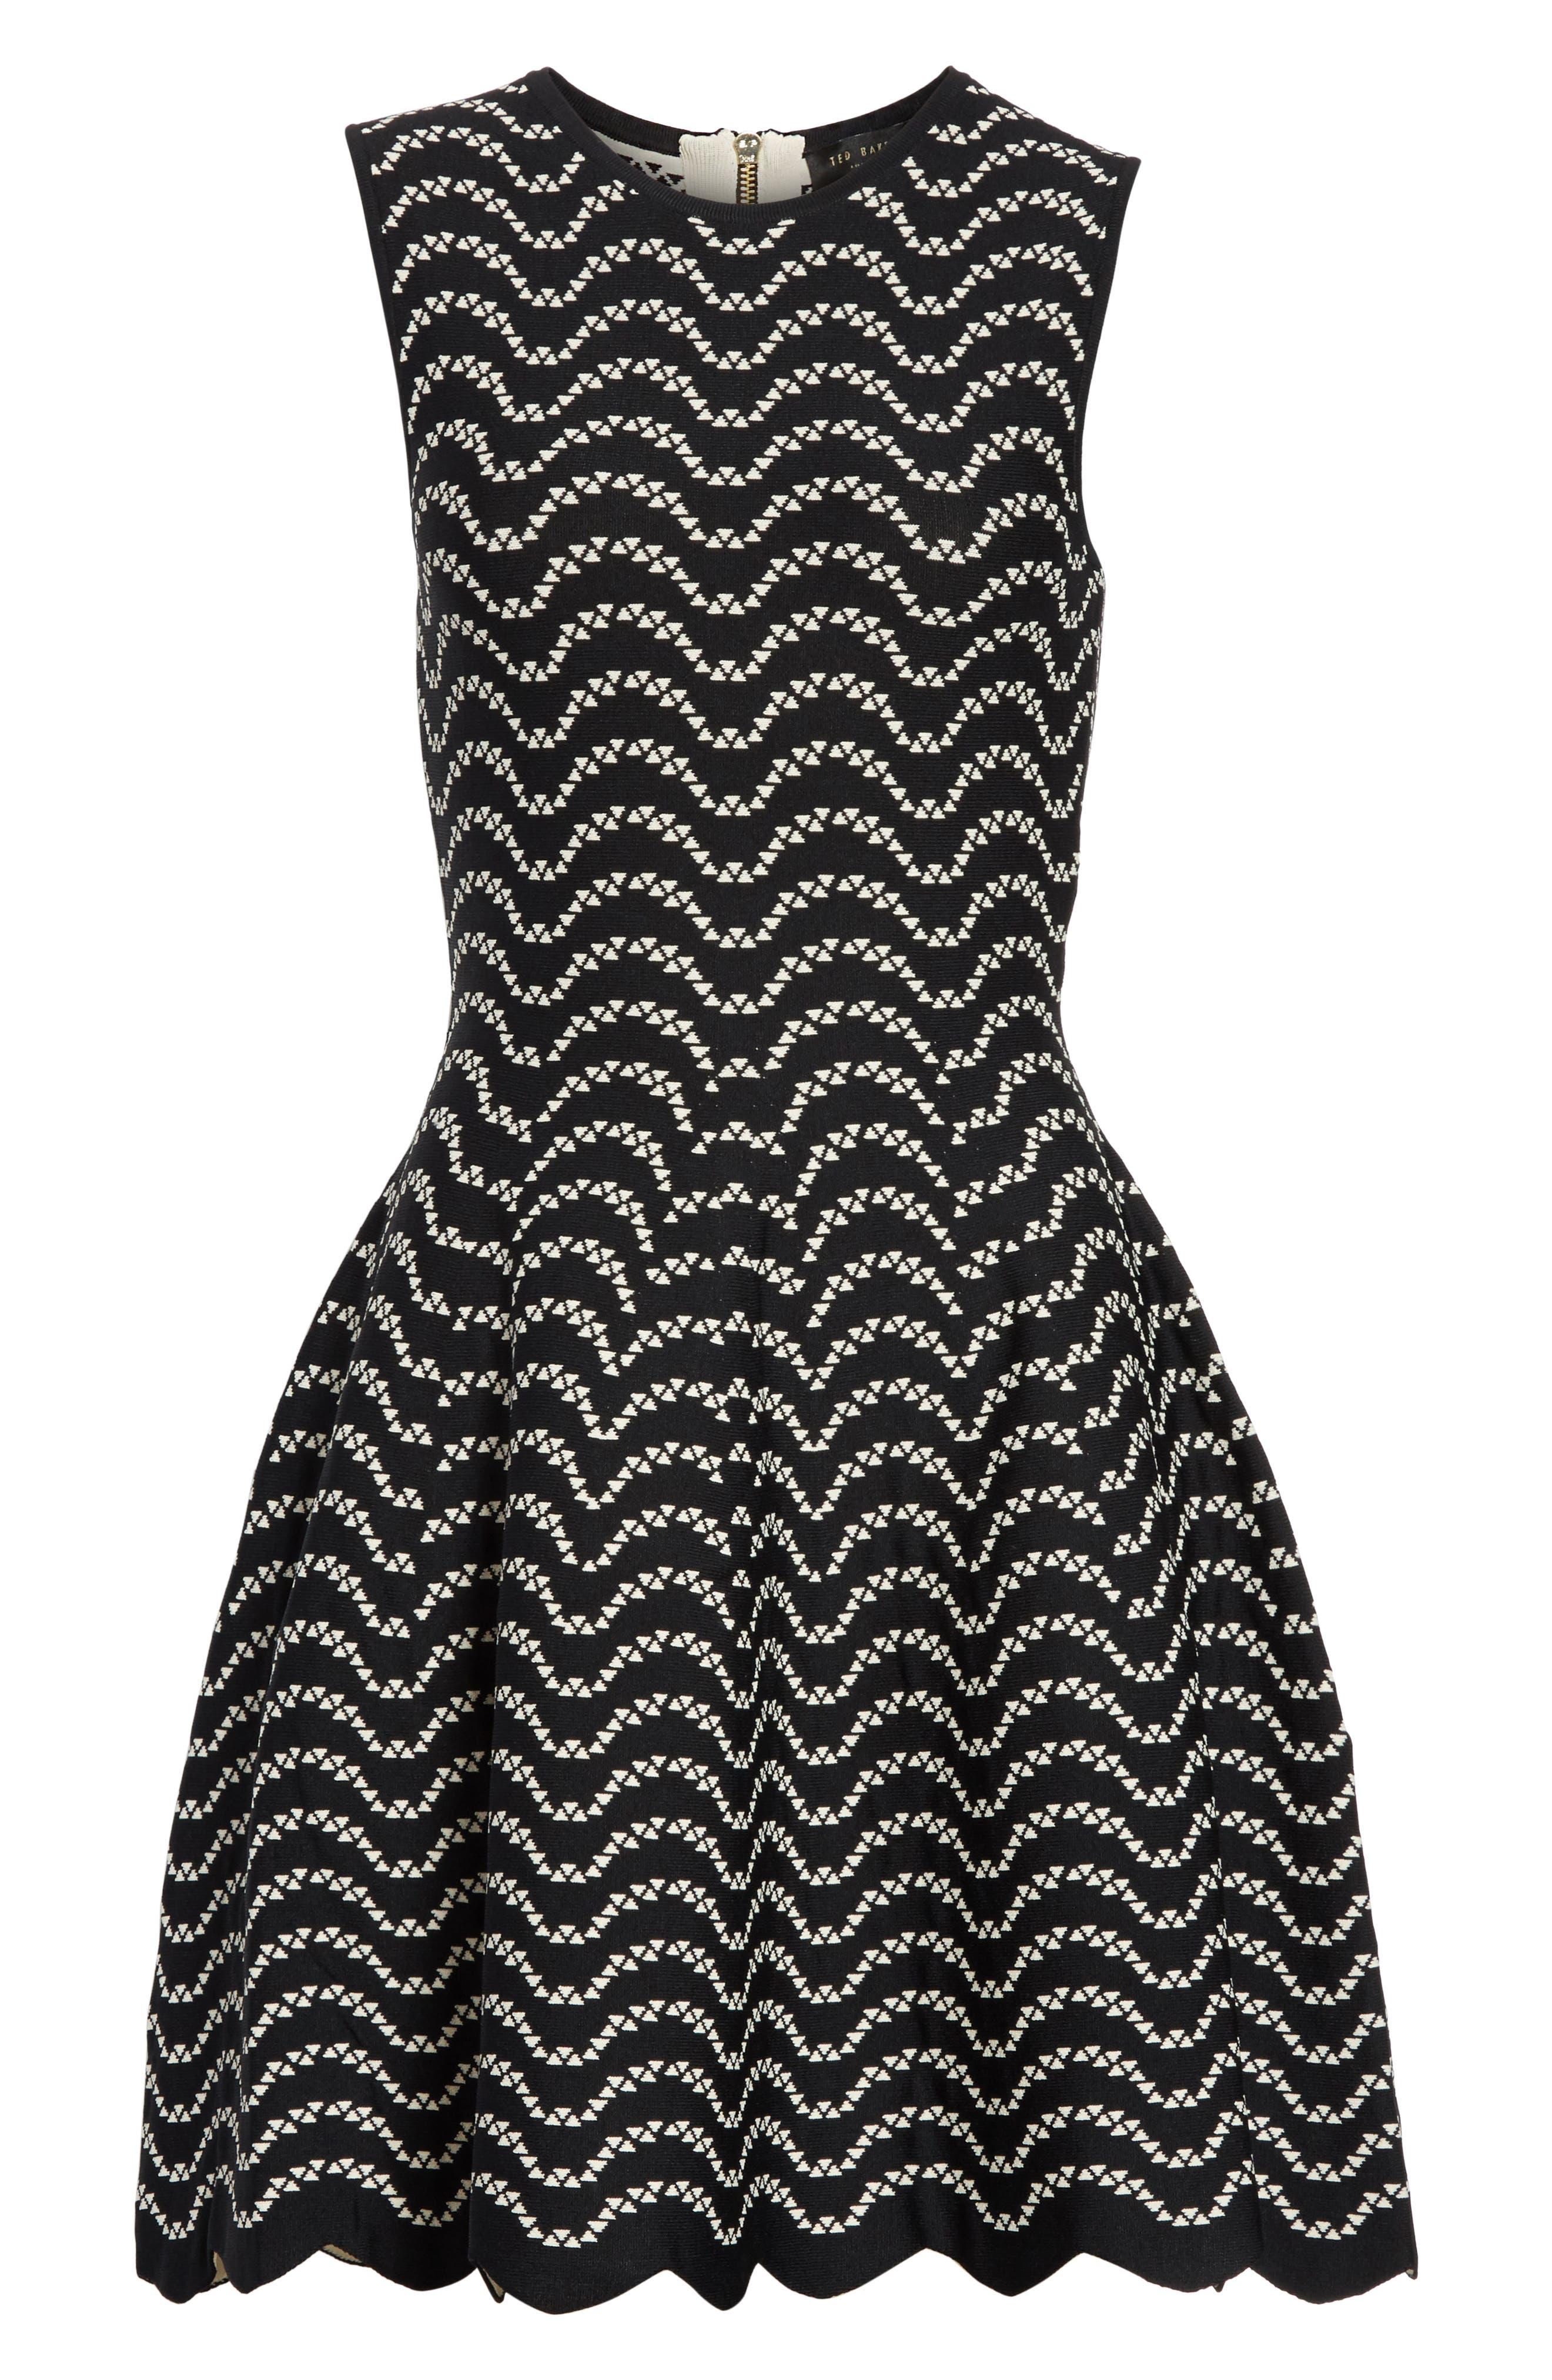 Bryena Jacquard Fit & Flare Dress,                             Alternate thumbnail 6, color,                             001